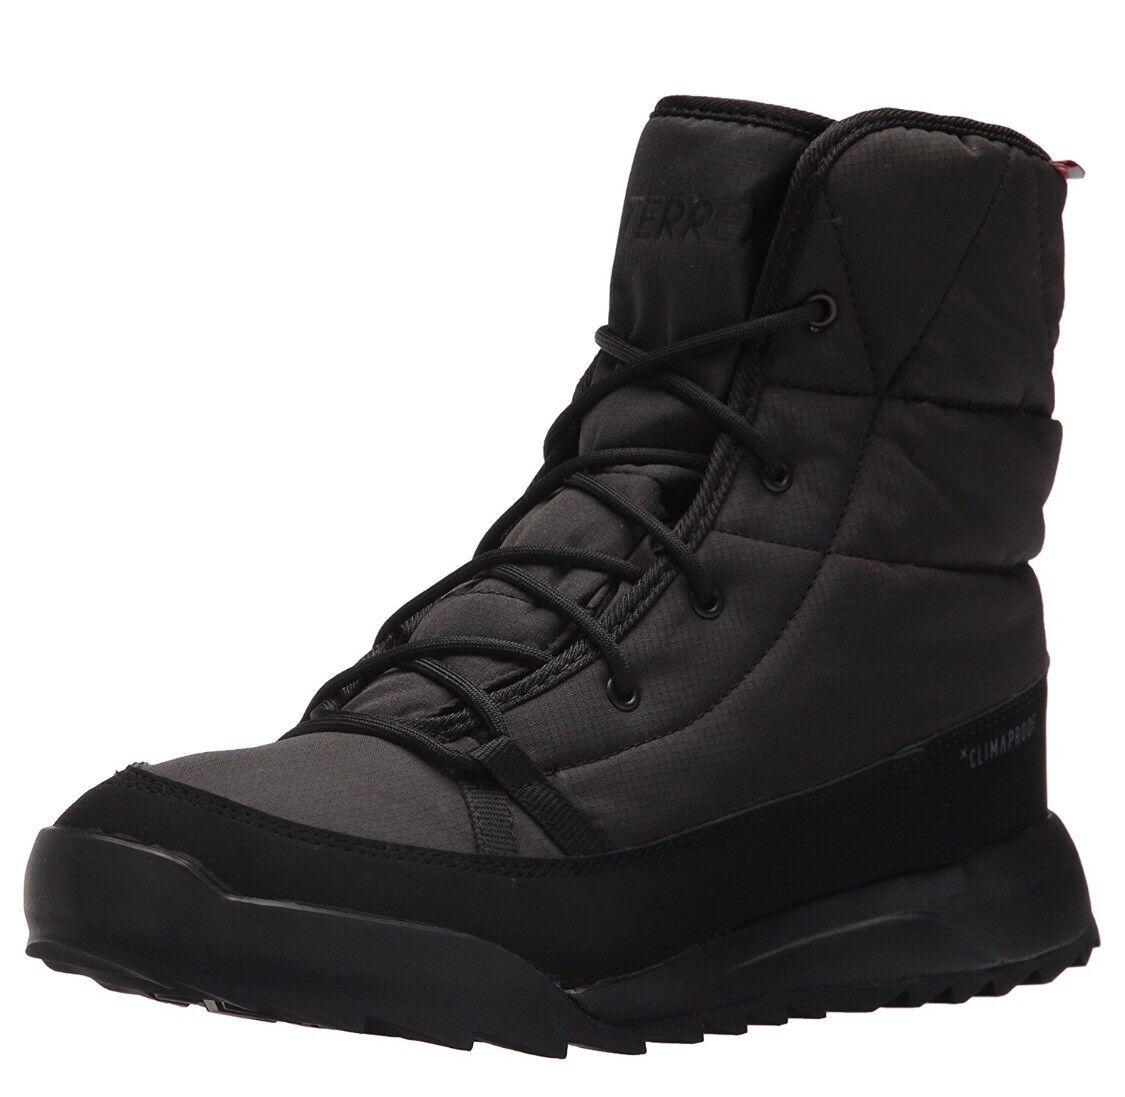 New Adidas Women's Terrex Choleah Padded Boot Walking Shoe Size 7